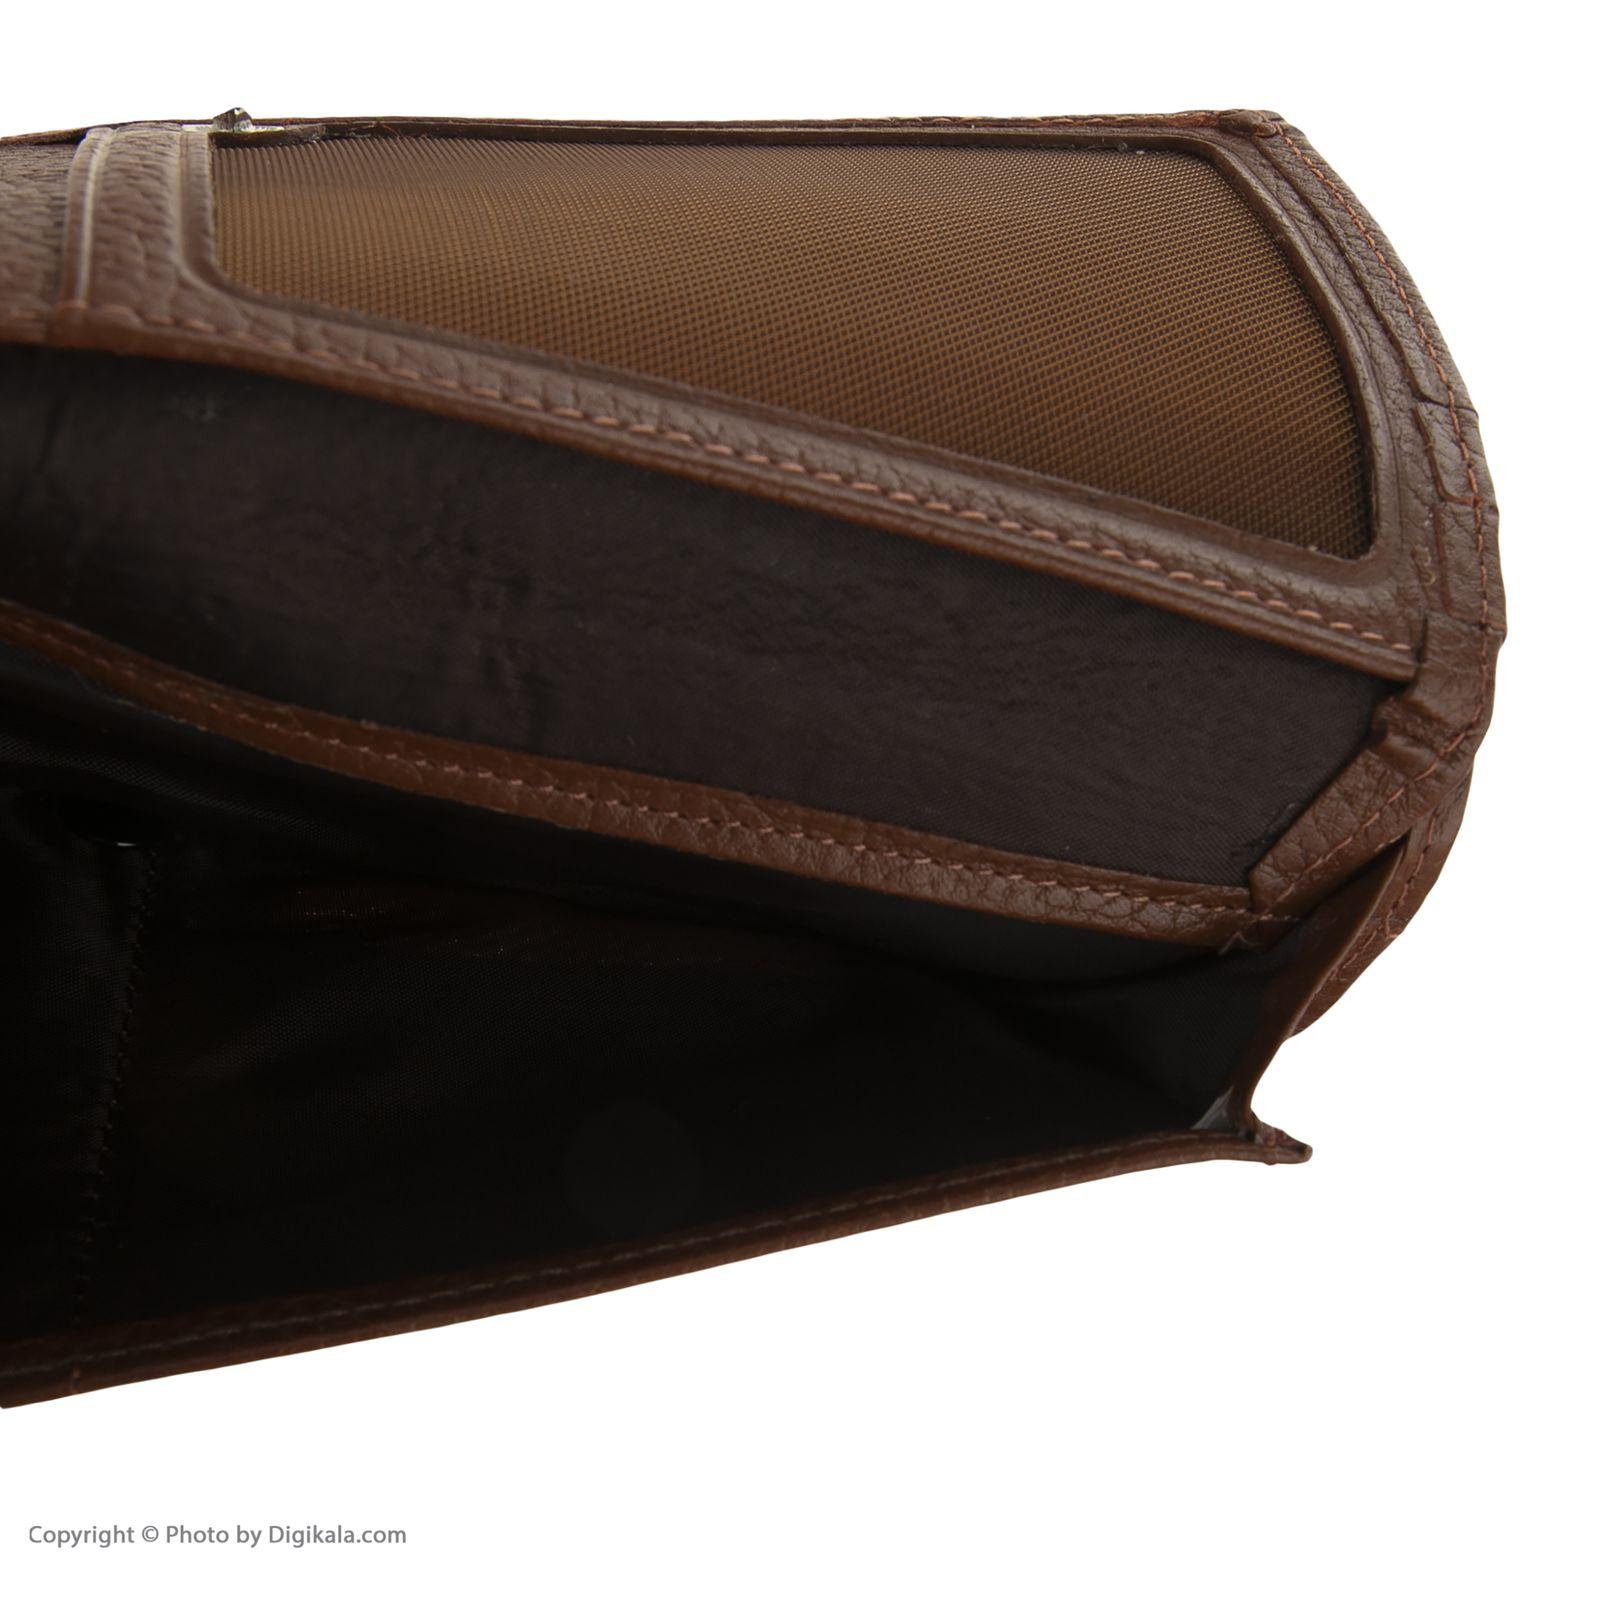 کیف پول چرمیران مدل 1002902 -  - 8